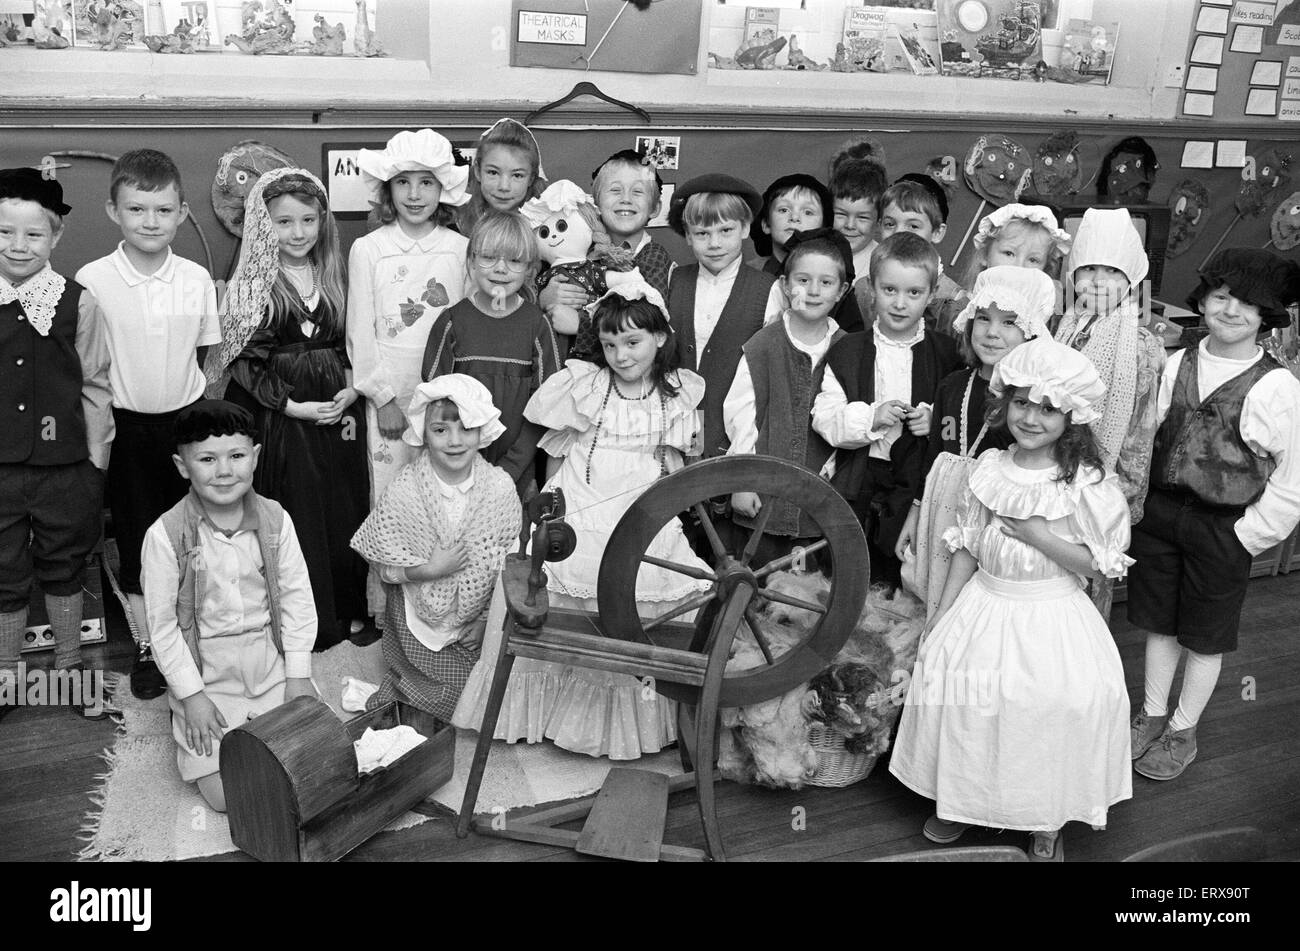 Helme CE School steps back to Tudor times. 28th November 1991. - Stock Image